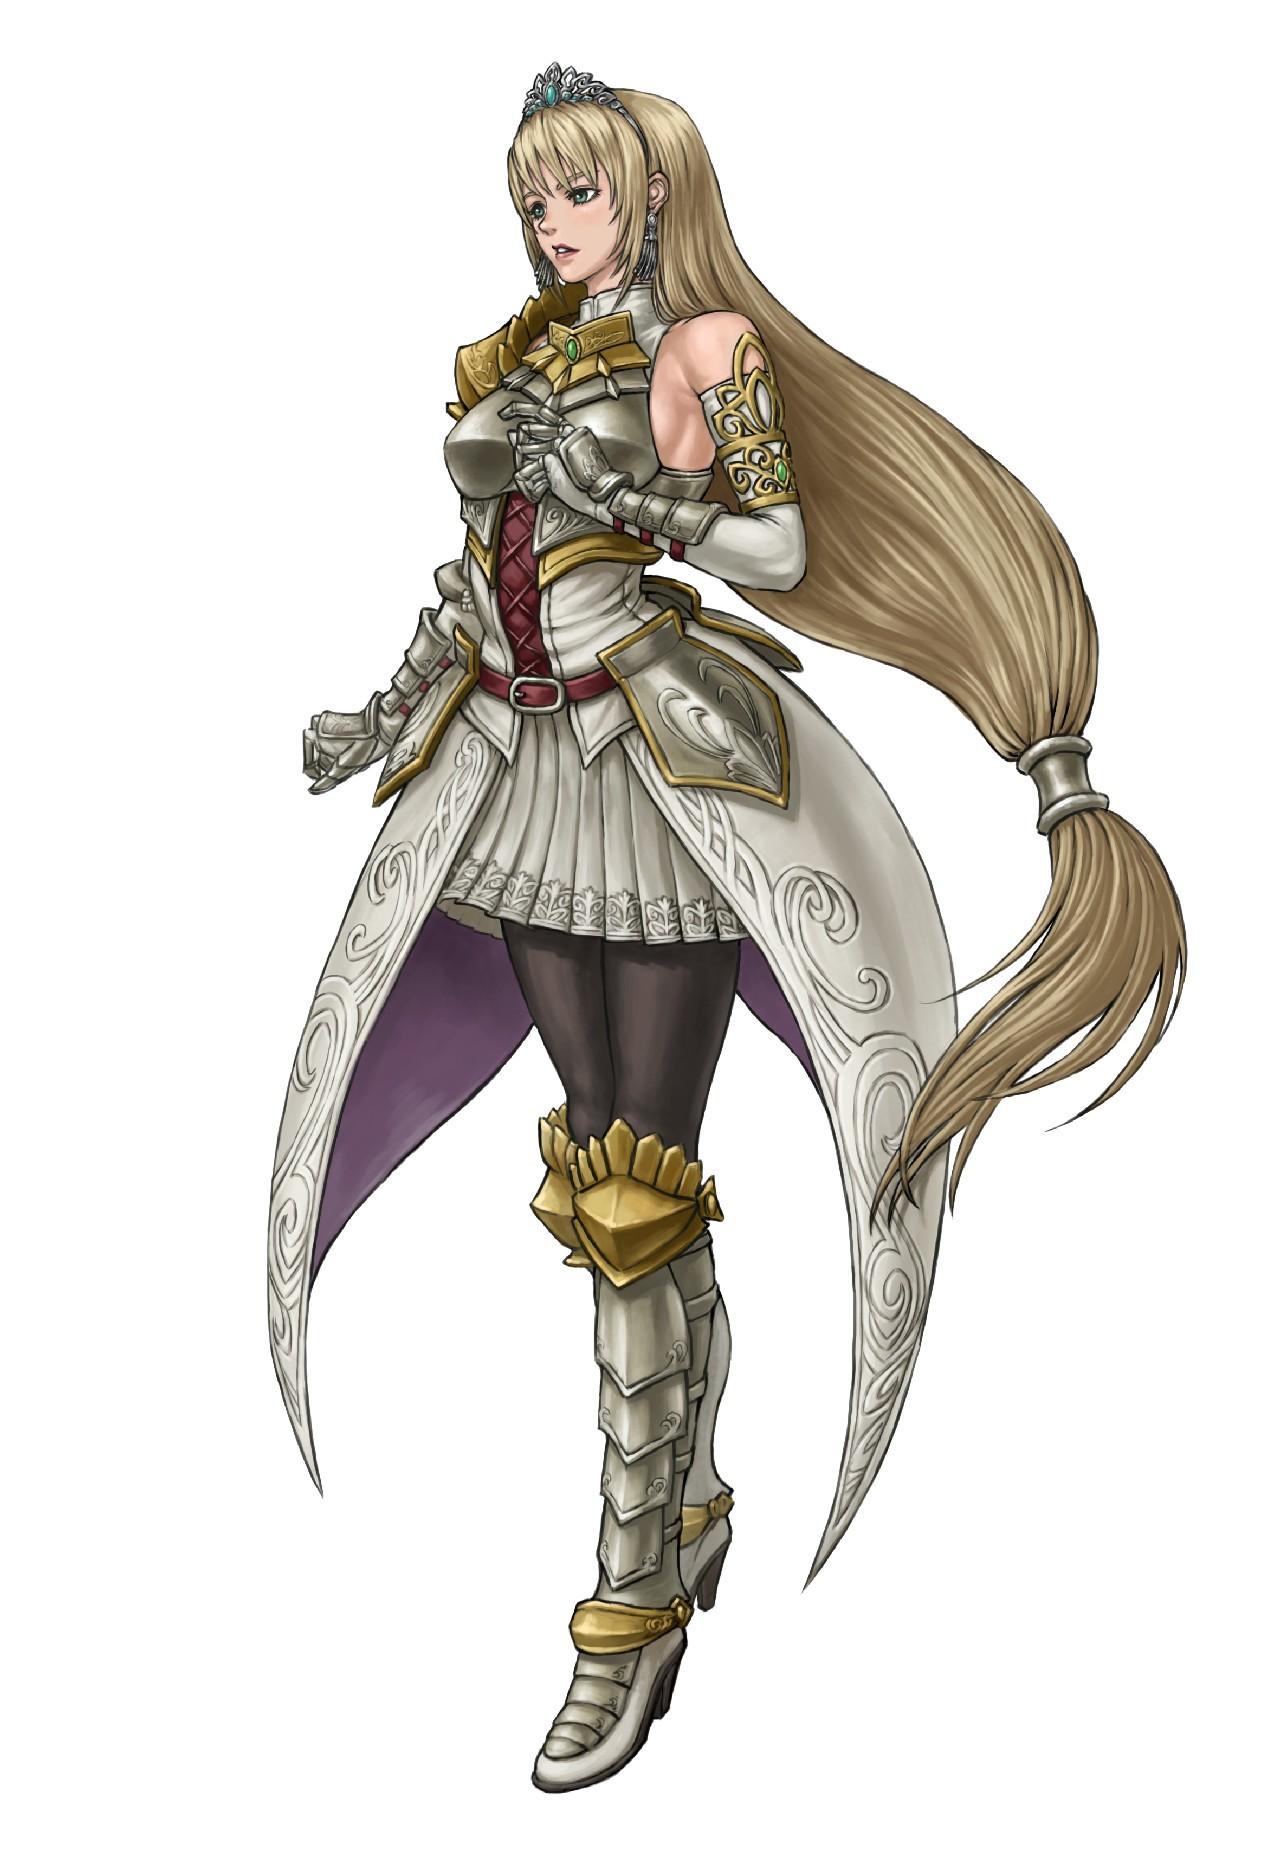 Valkyria ~ princess knight